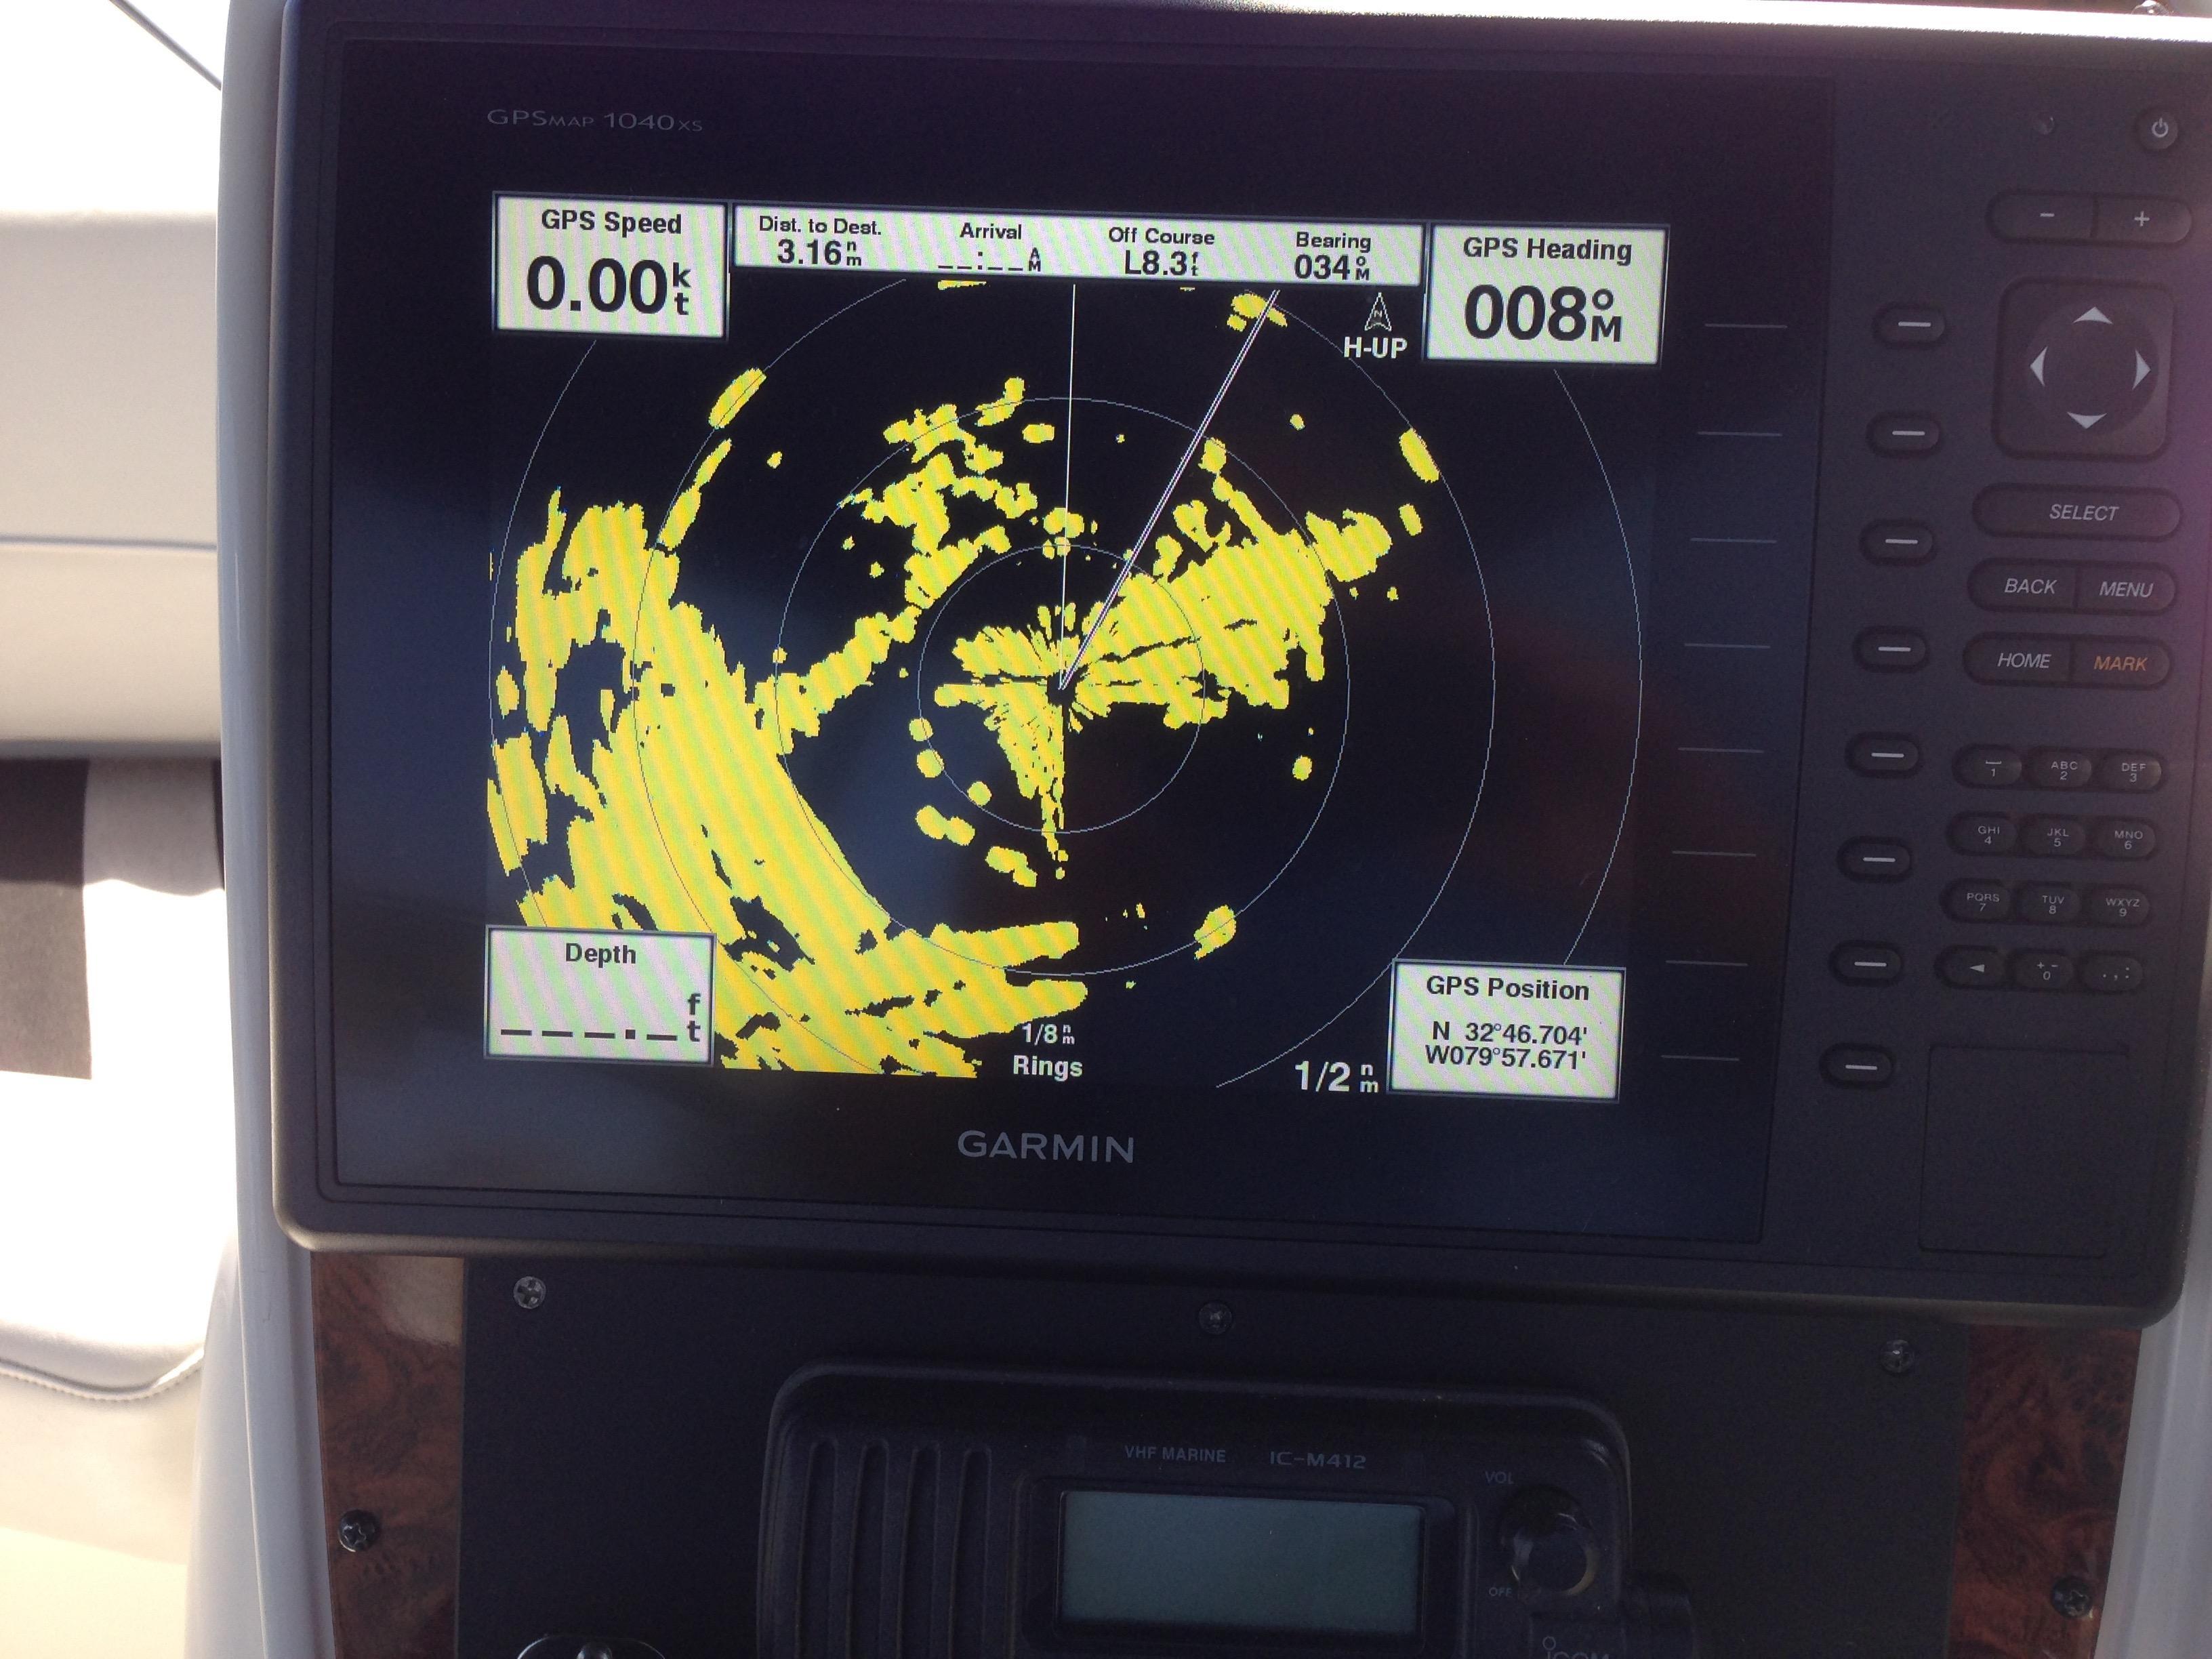 Meridian 411 Sedan - 36 NM radar